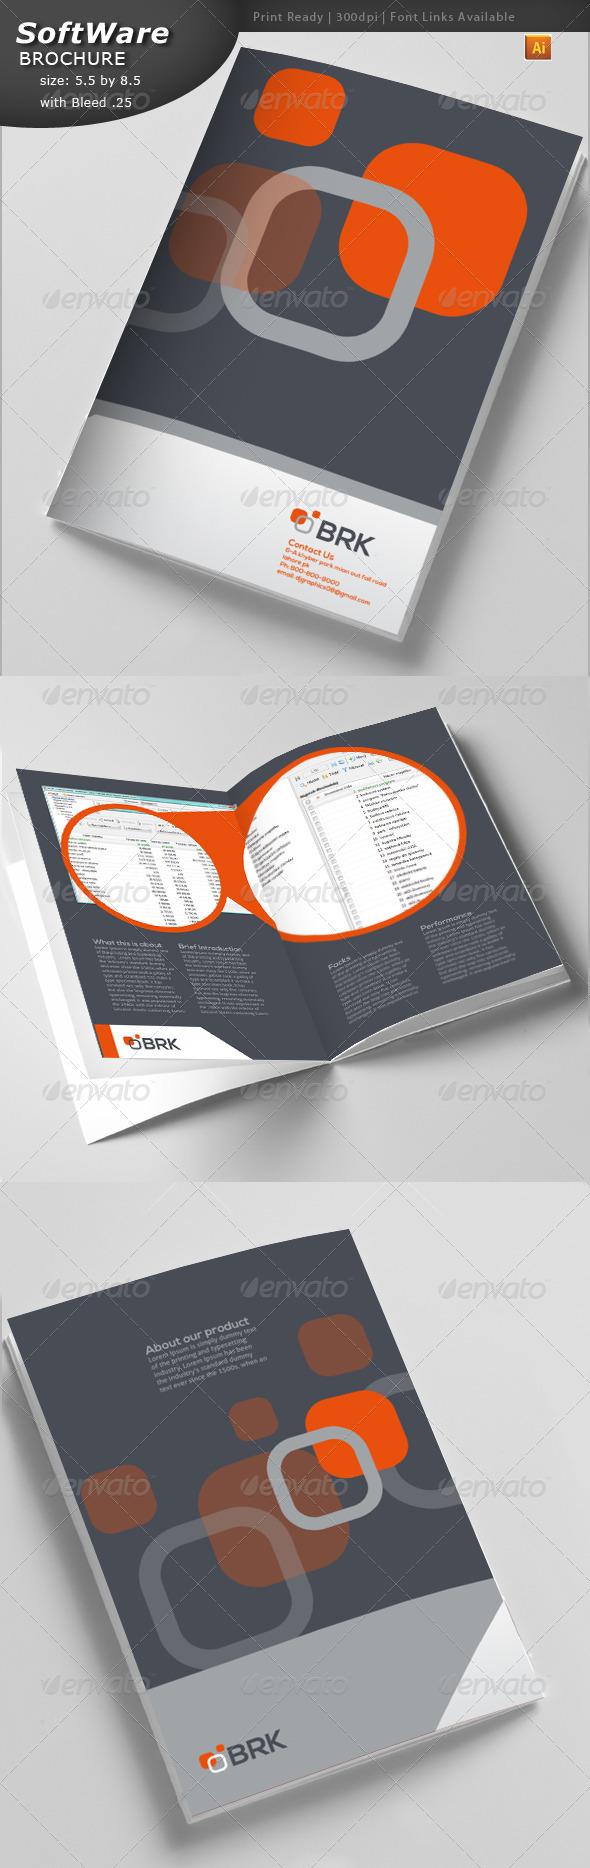 IT Brochure  - Brochures Print Templates